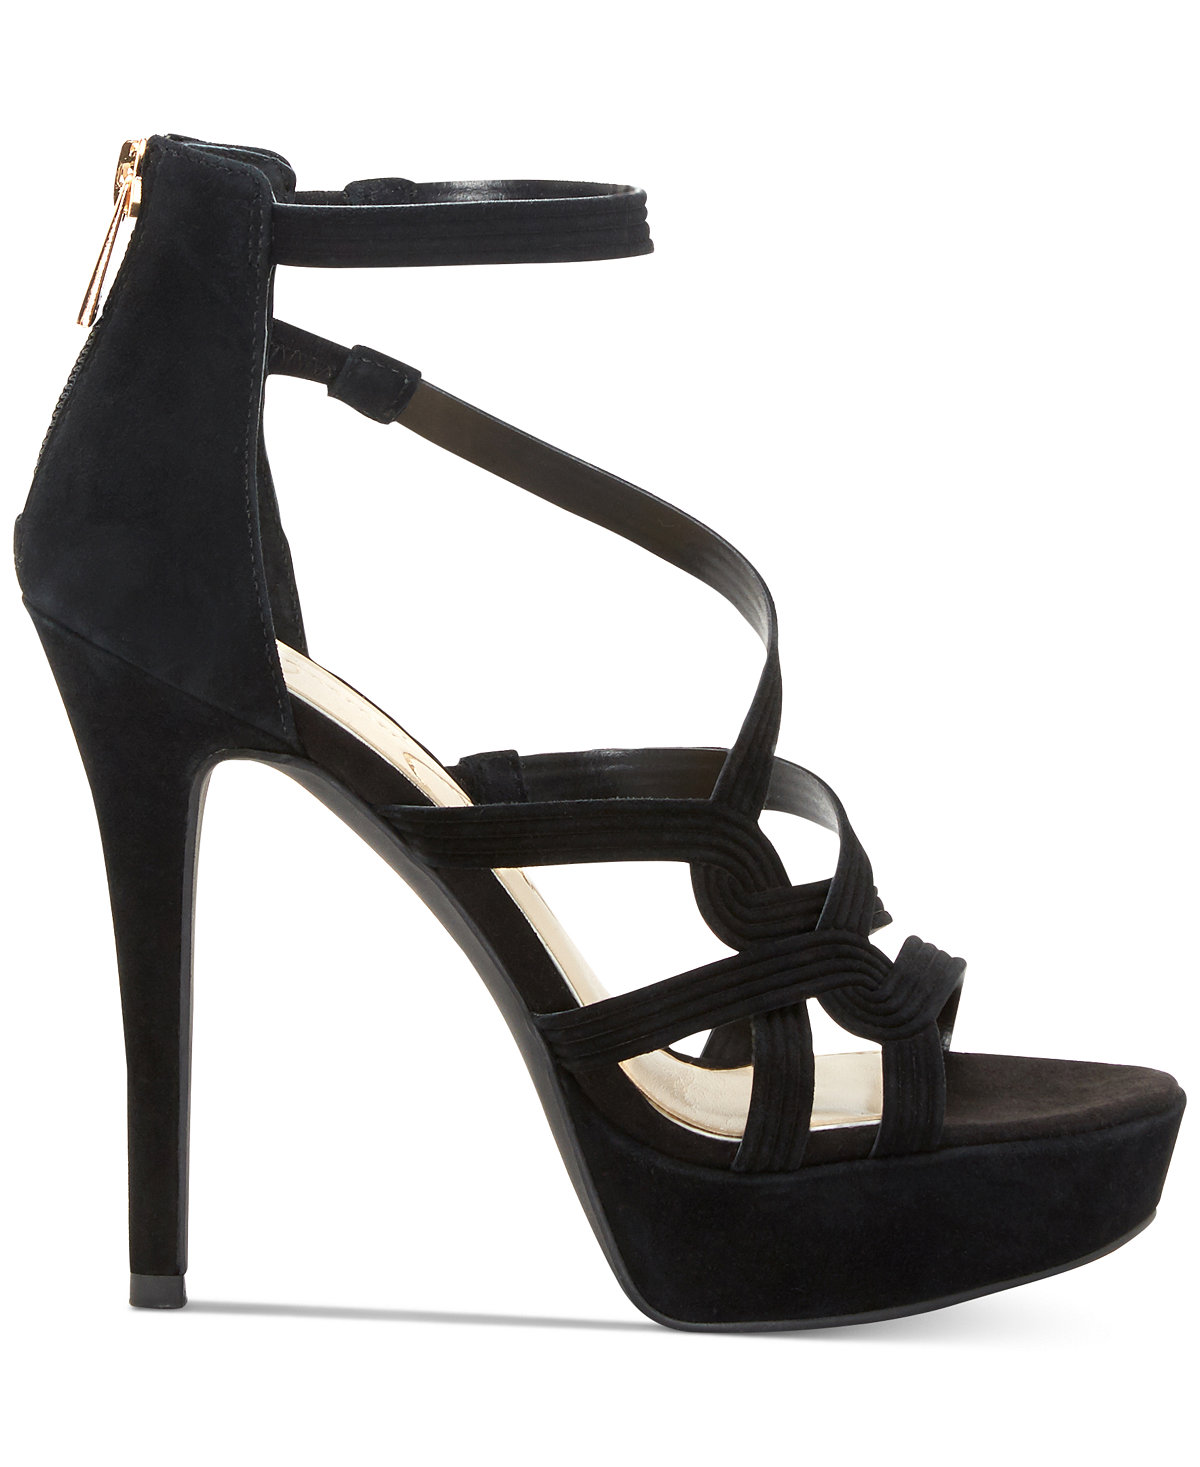 Jessica-Simpson-Womens-Bellanne-Caged-Platform-Strappy-Heels thumbnail 20